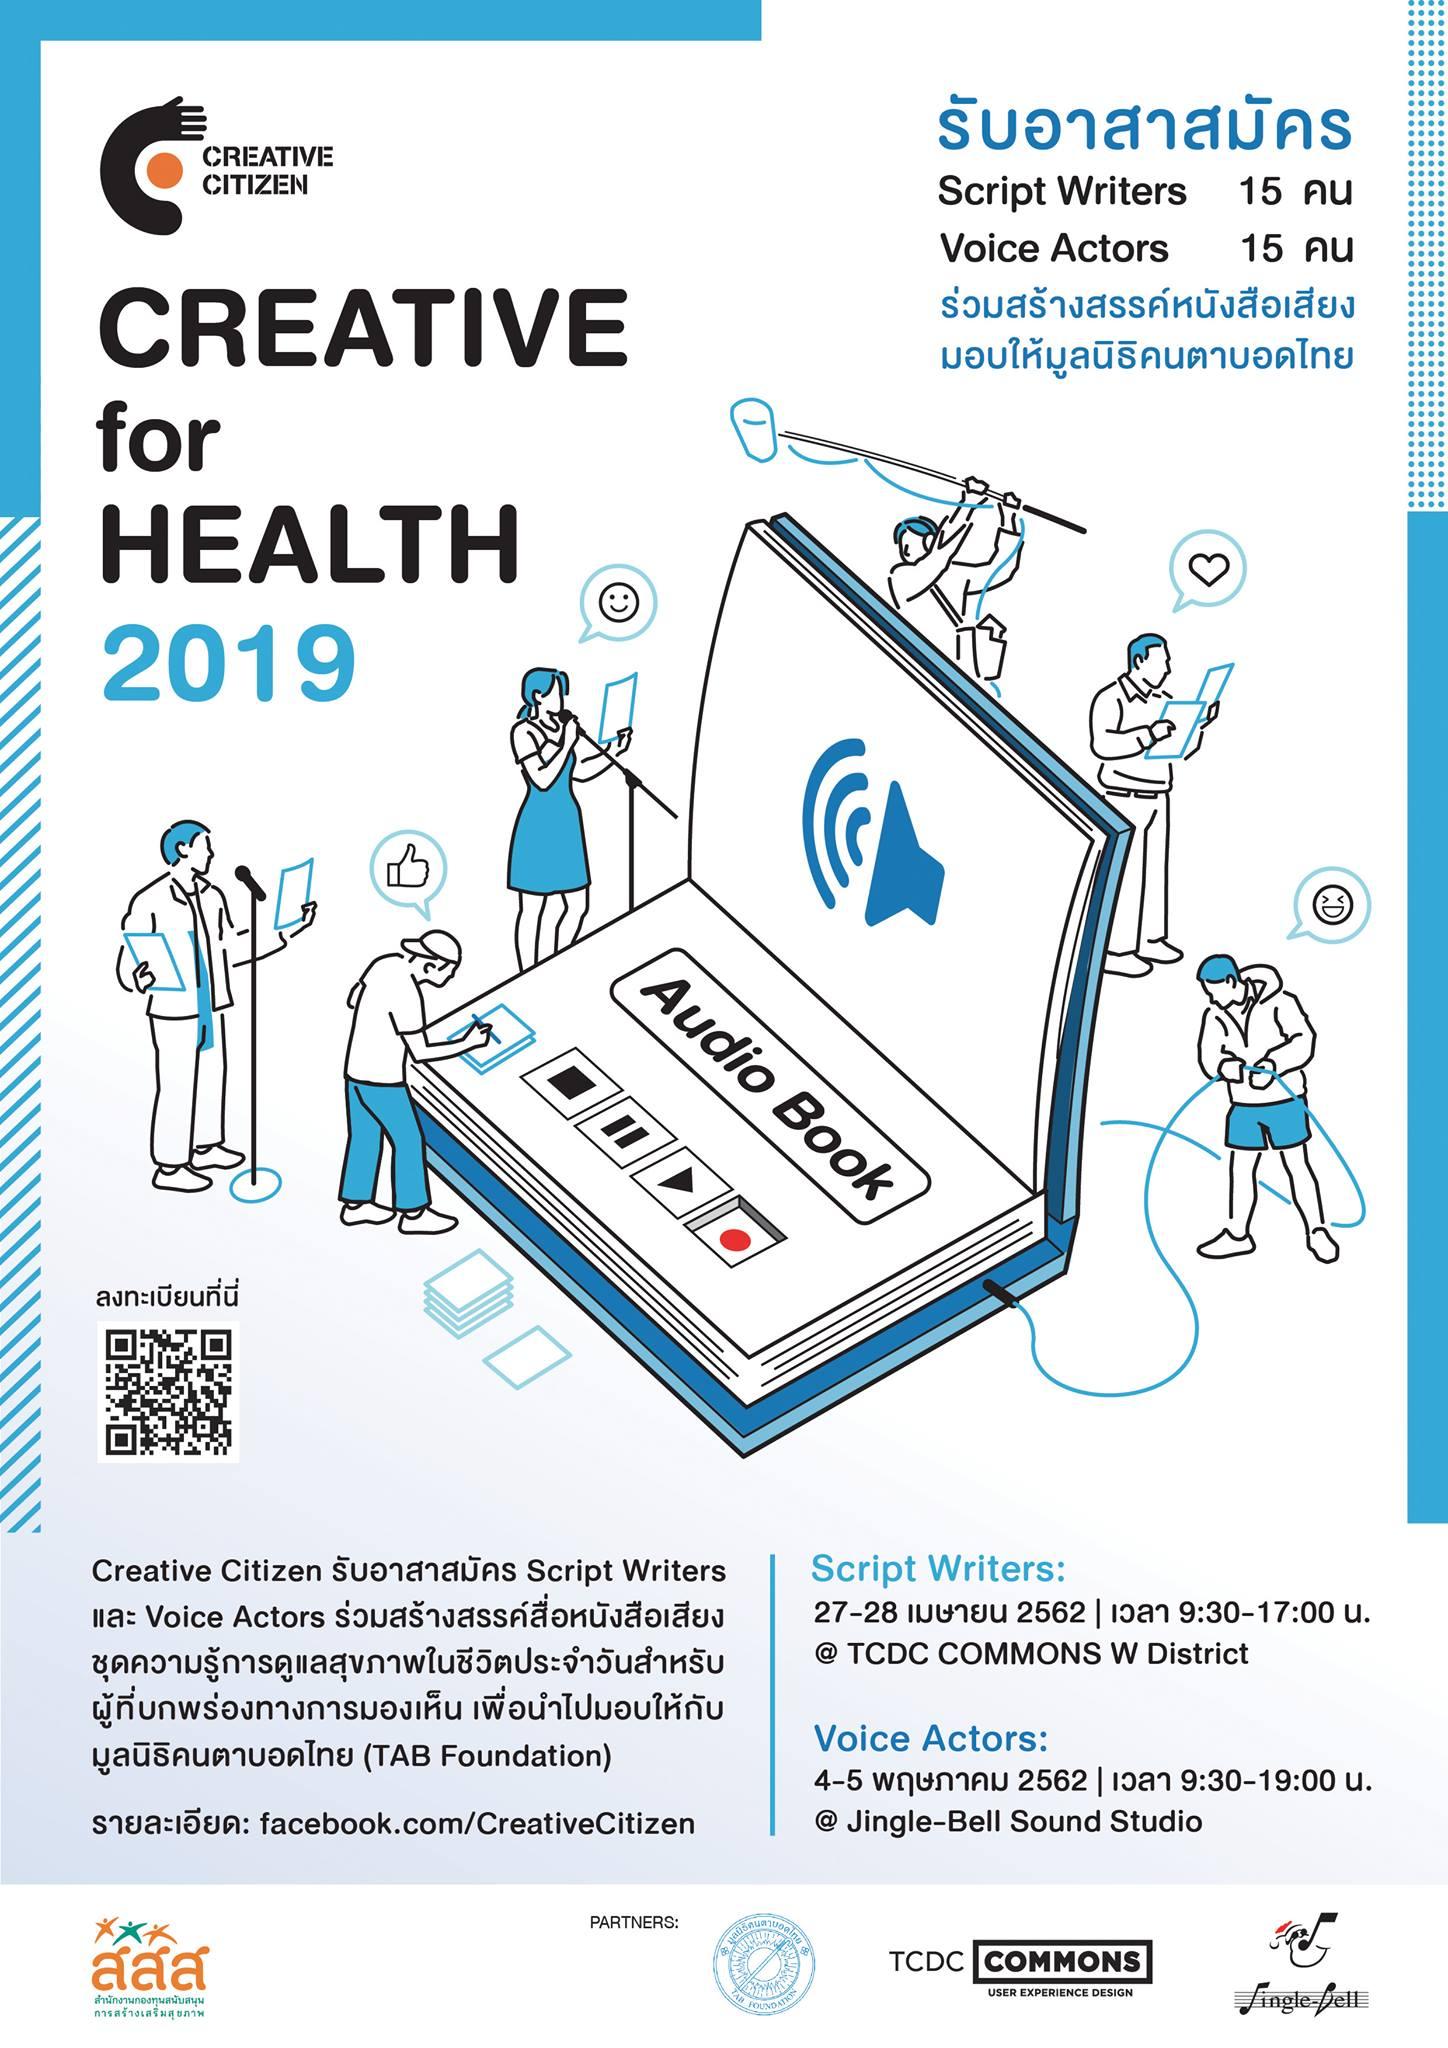 Creative for Health 2019 สร้างสรรค์สื่อหนังสือเสียงชุดความรู้สุขภาพเพื่อผู้บกพร่องทางการมองเห็น